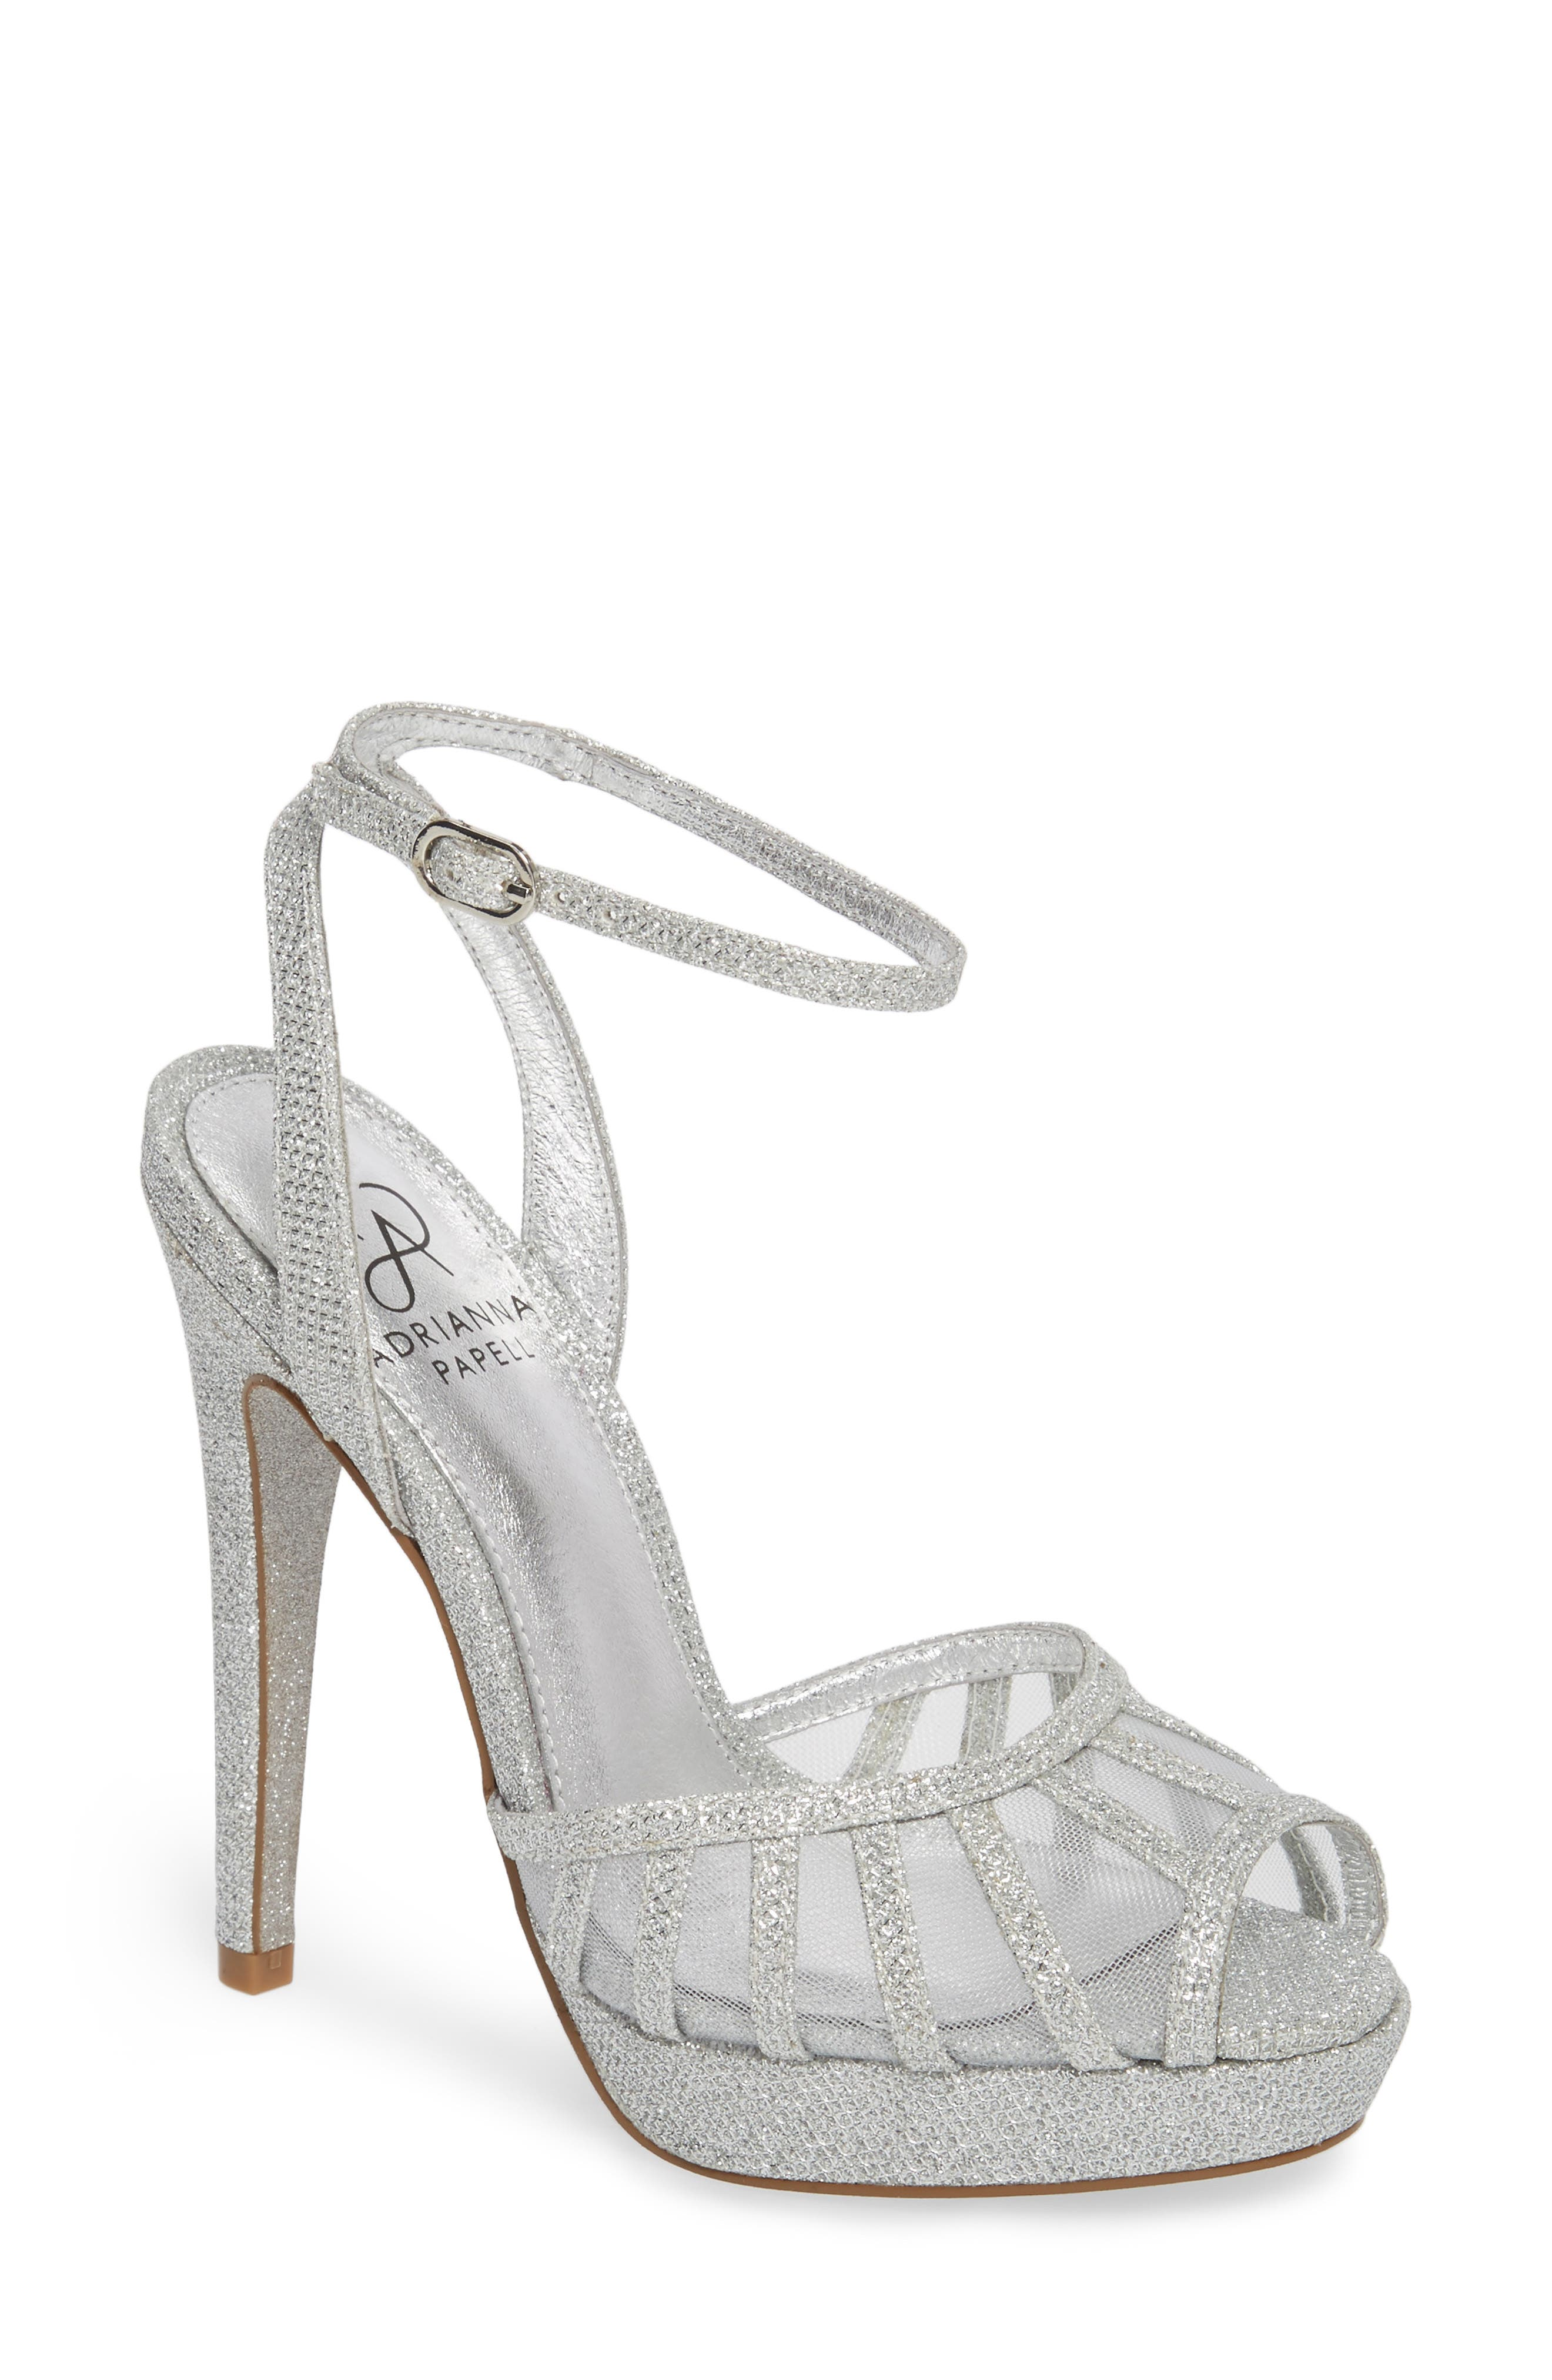 Alternate Image 1 Selected - Adrianna Papell Saida Platform Sandal (Women)